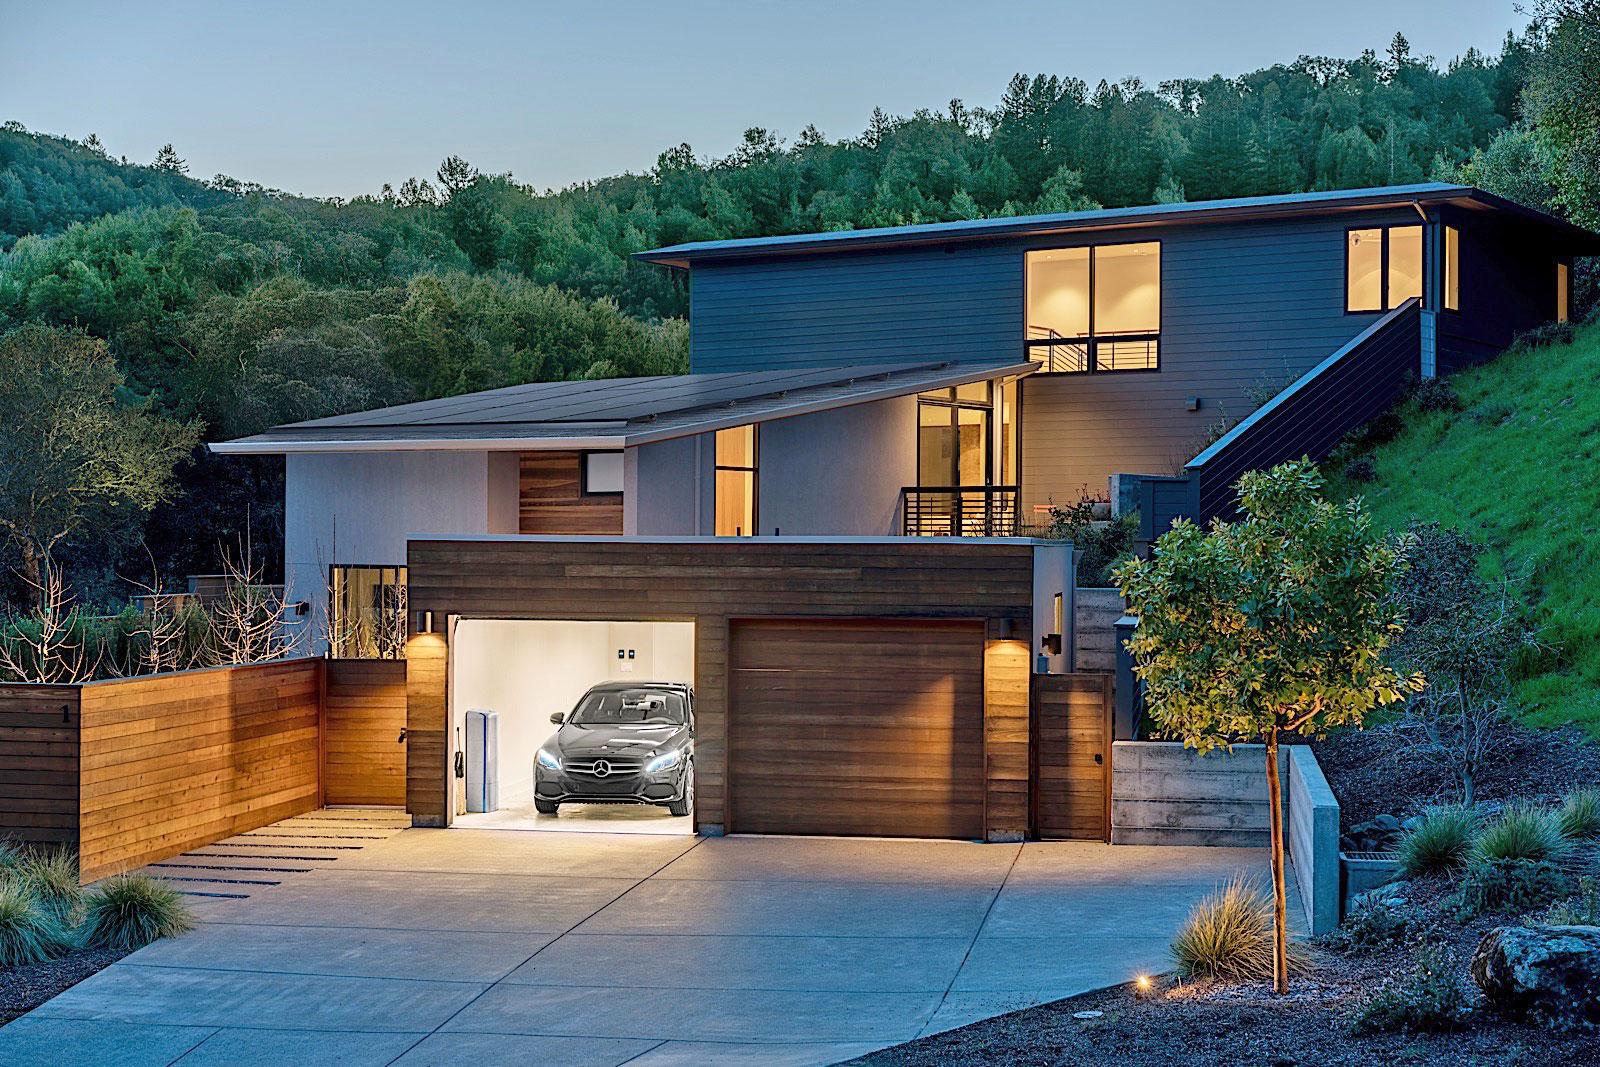 Vivint solar reviews california - Mercedes